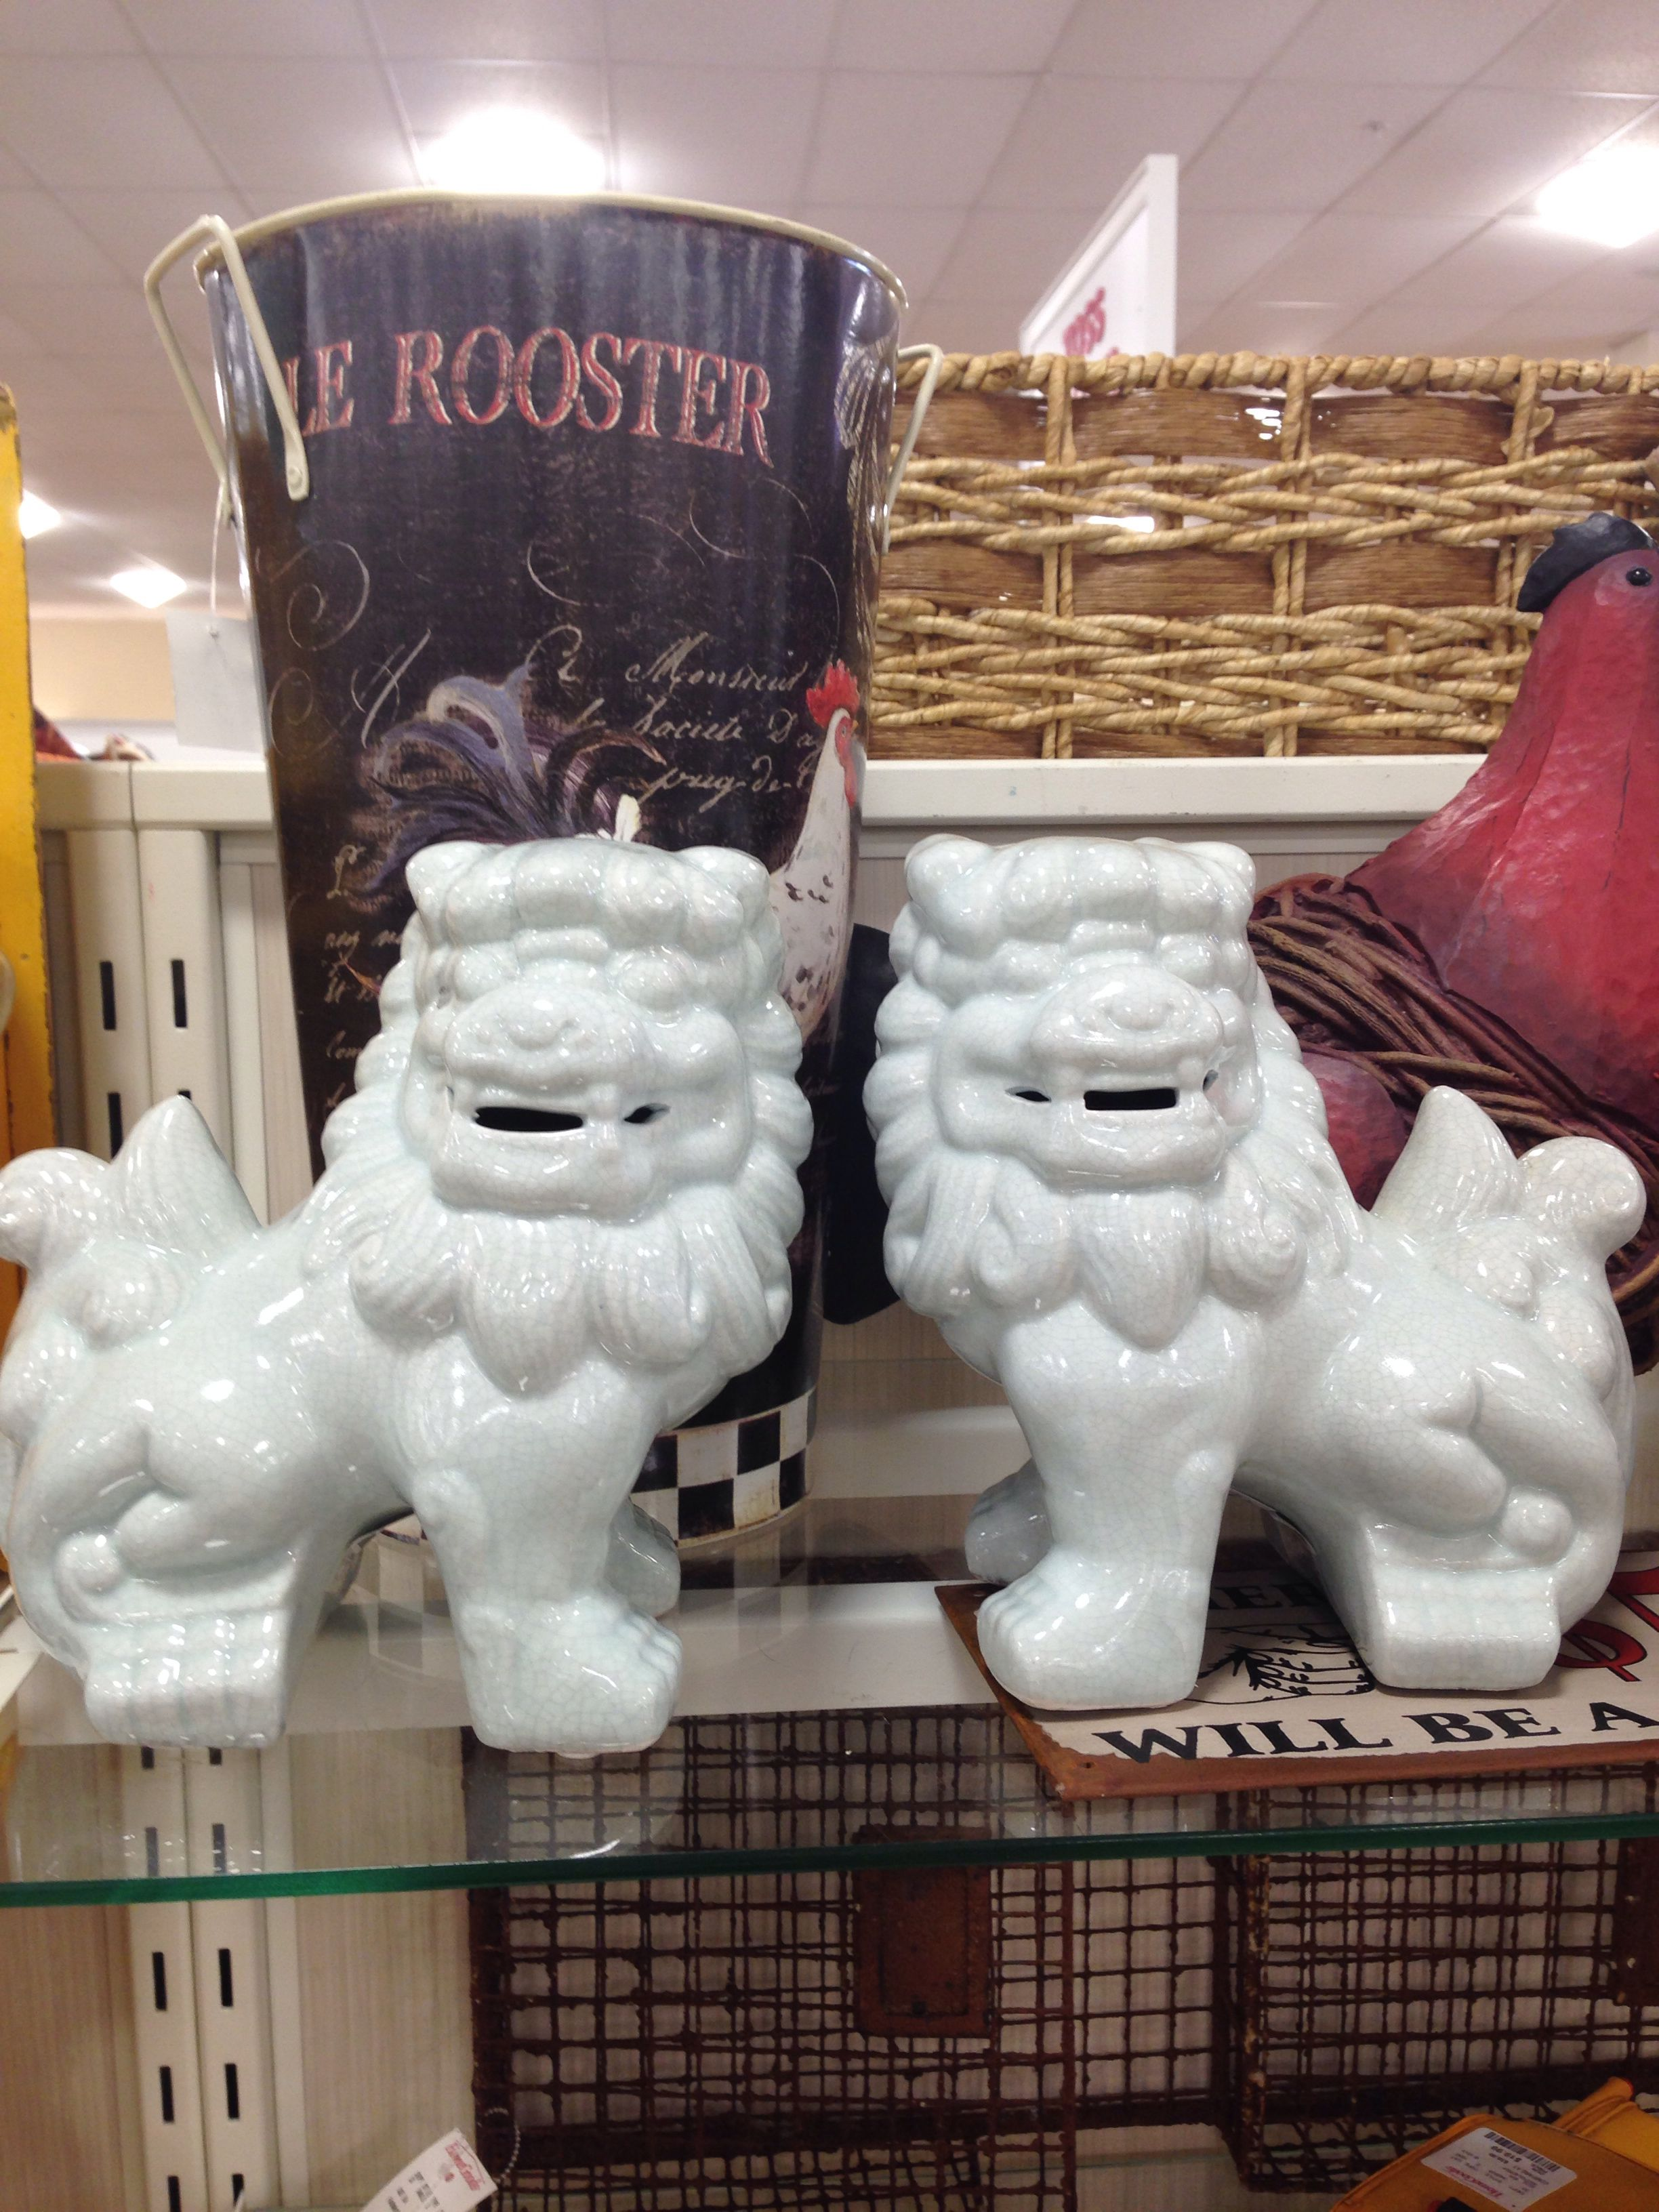 Foo dogs Home goods store, Foo dog, Home goods